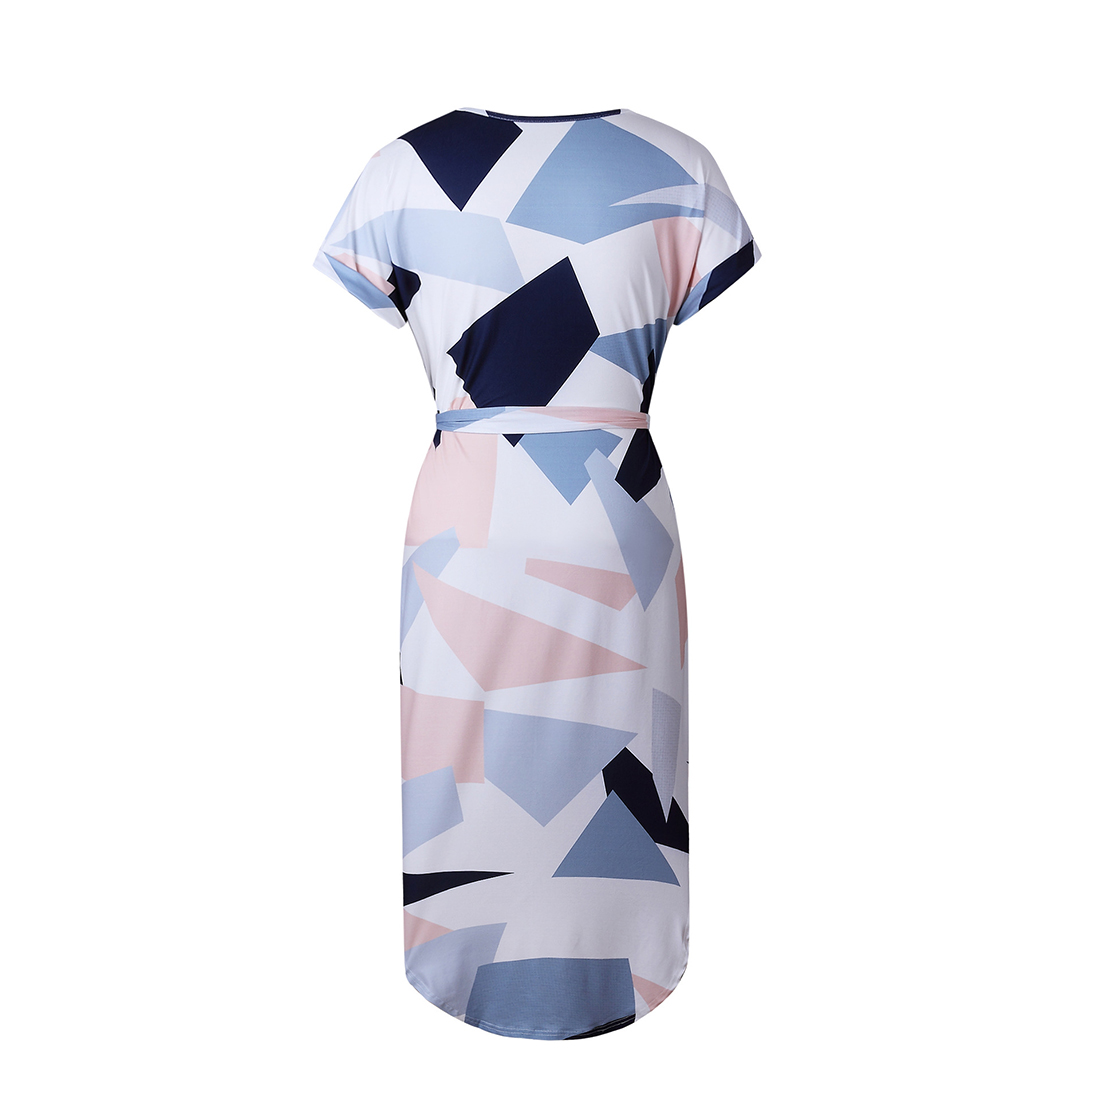 YJSFG HAUS Elegante Frauen Tunika Abendgesellschaft Kleider Sommer - Damenbekleidung - Foto 3